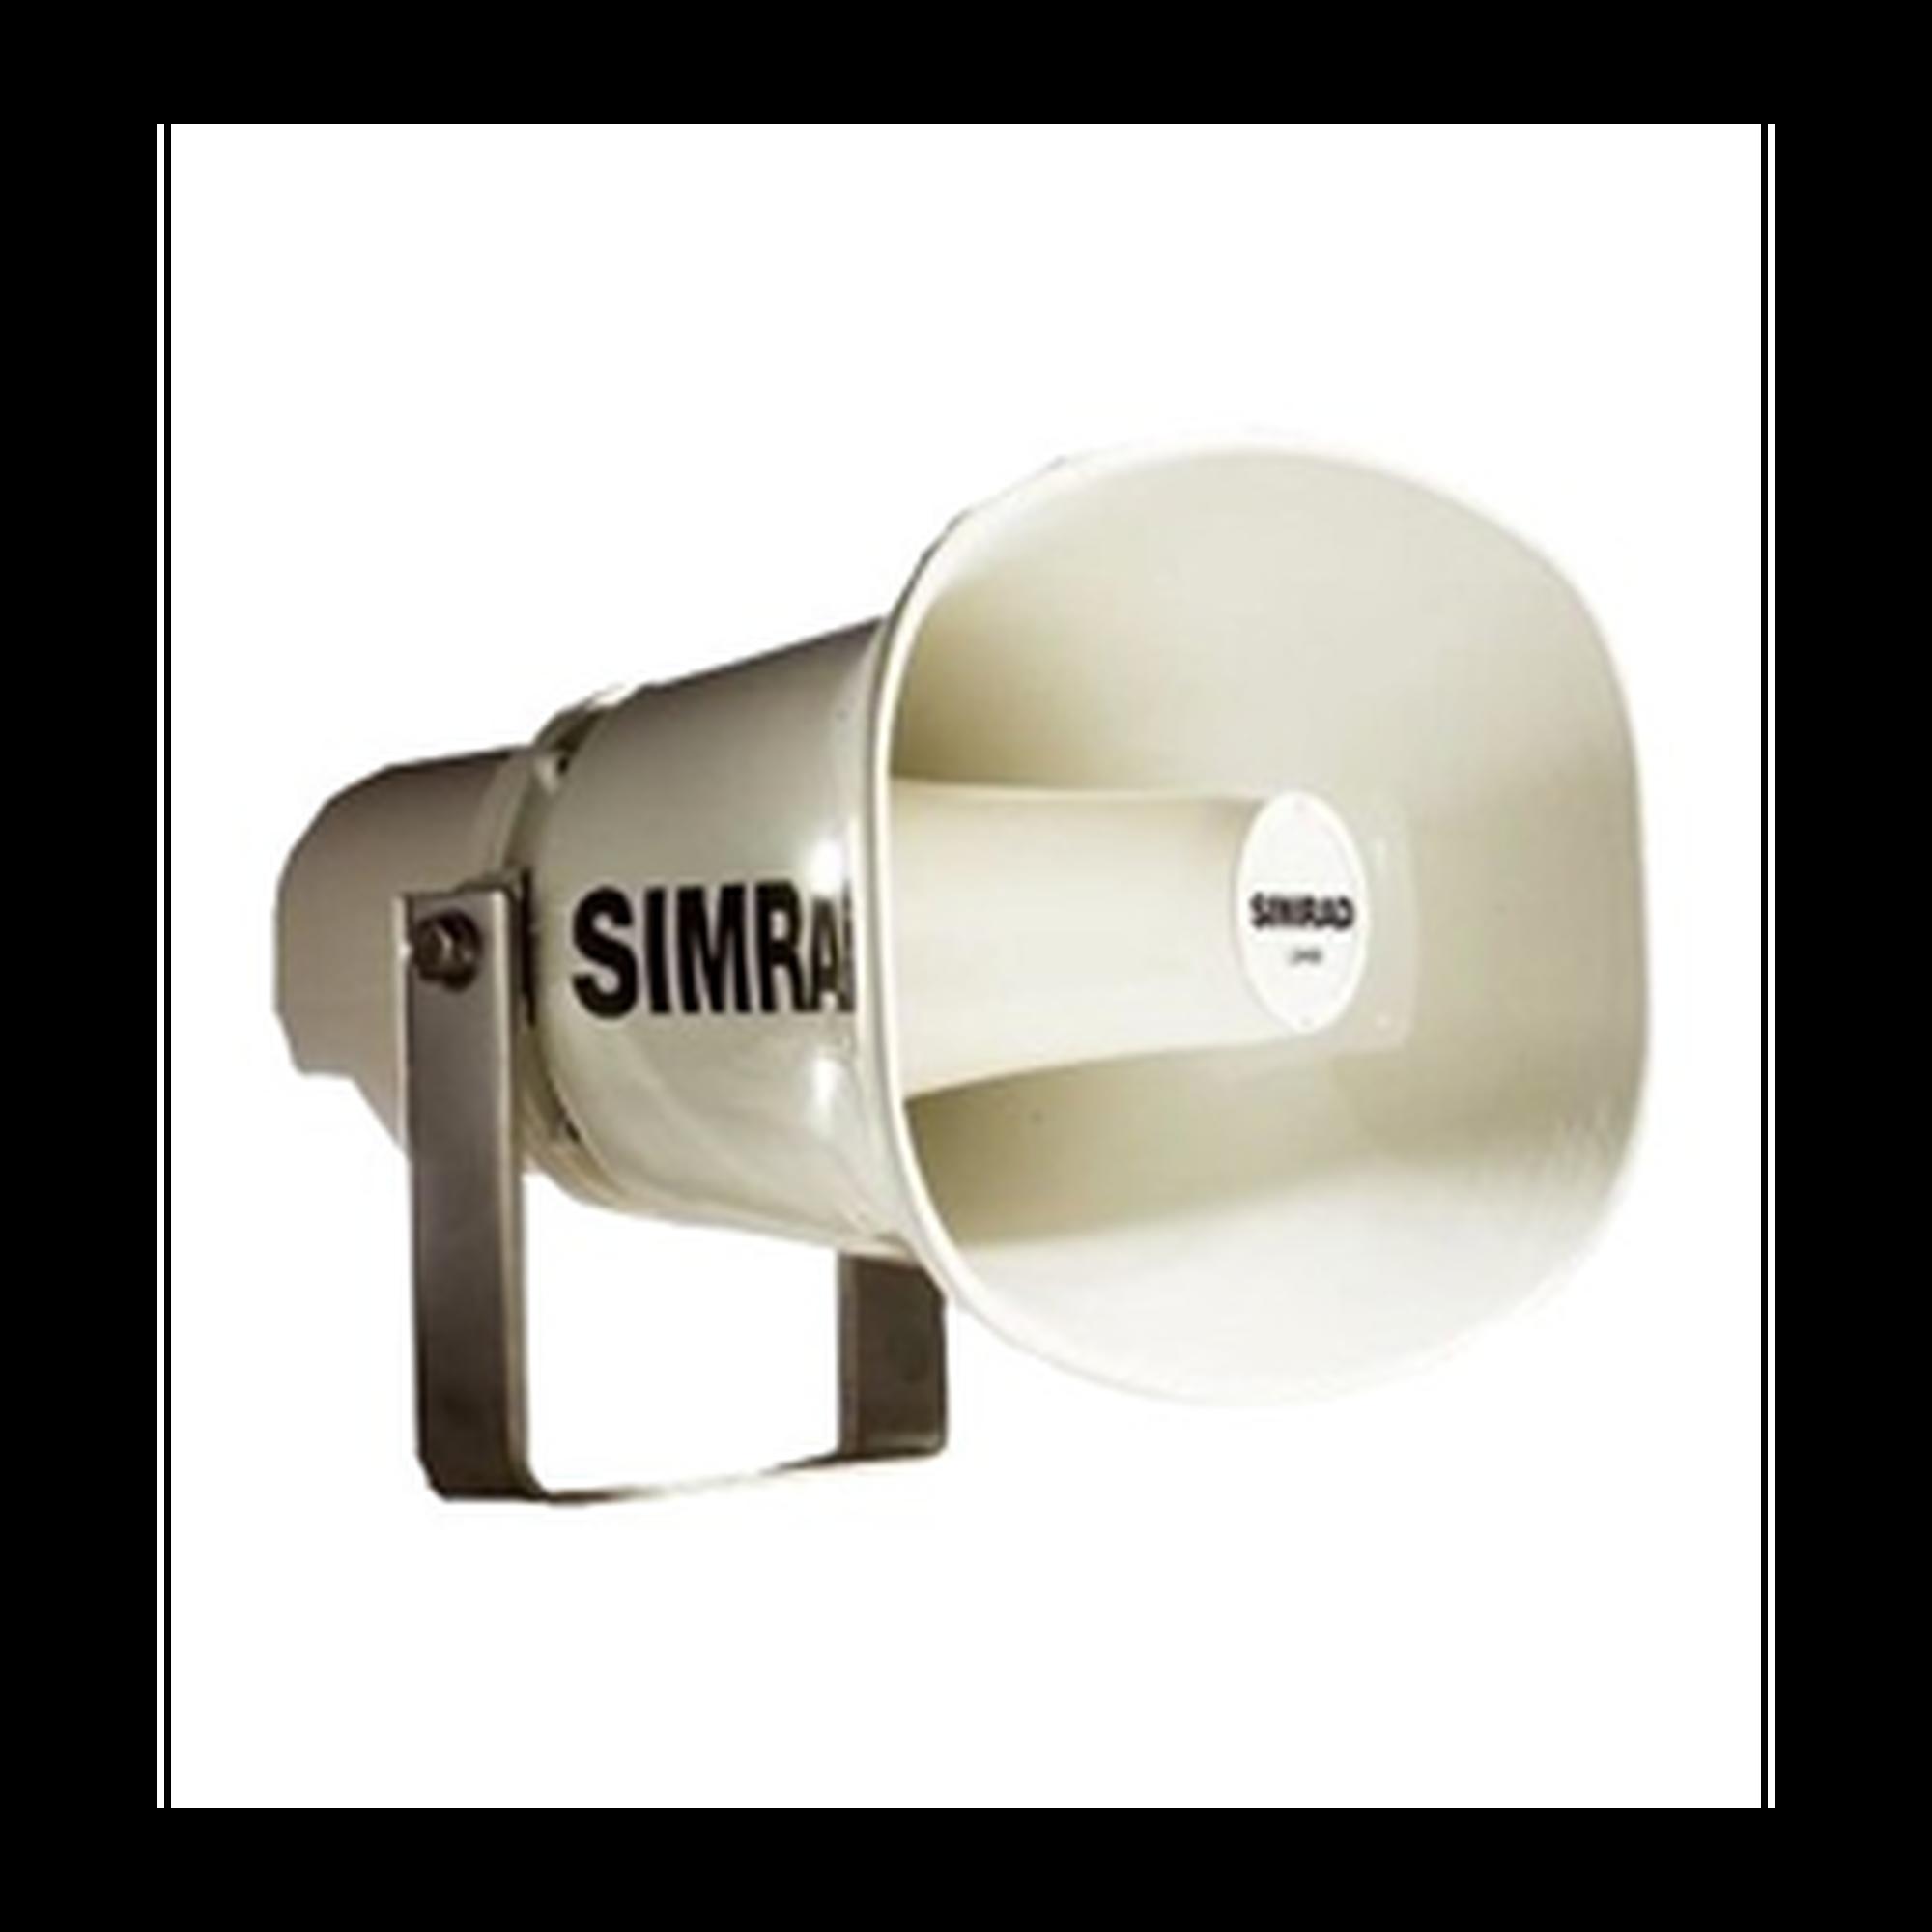 Megáfono / bocina LSH80 a a prueba de agua.